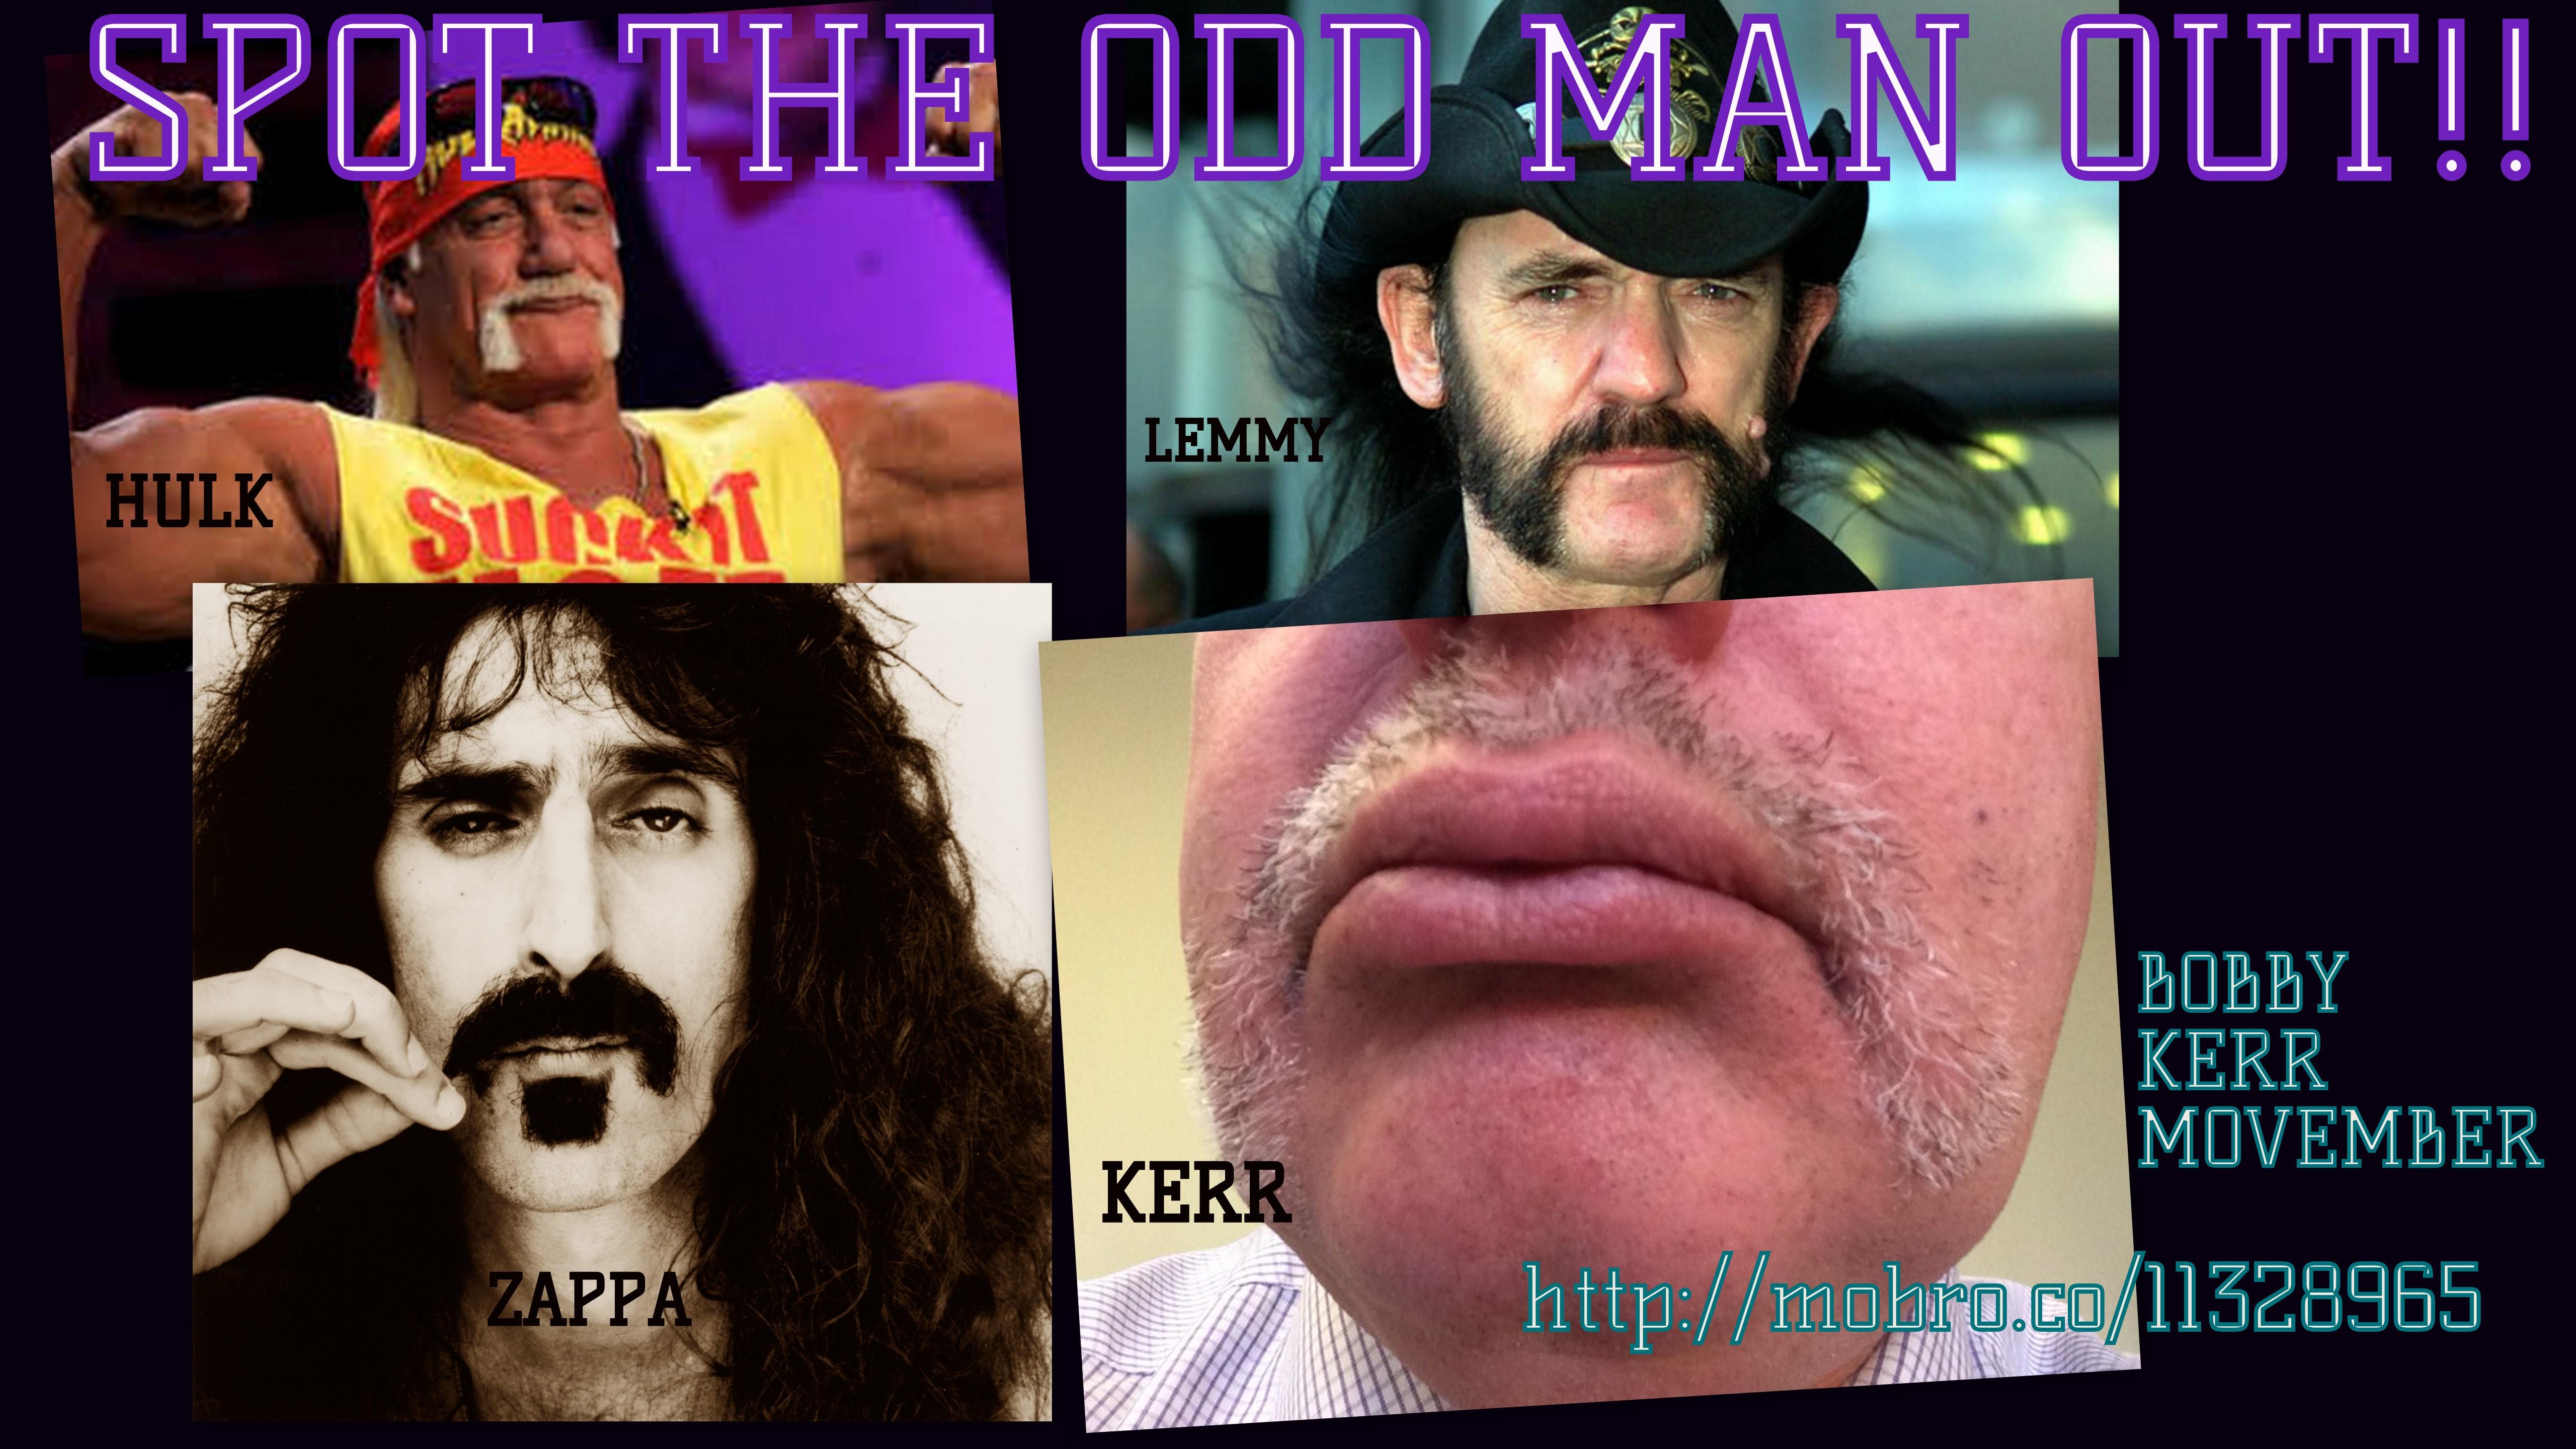 Kerr Movember